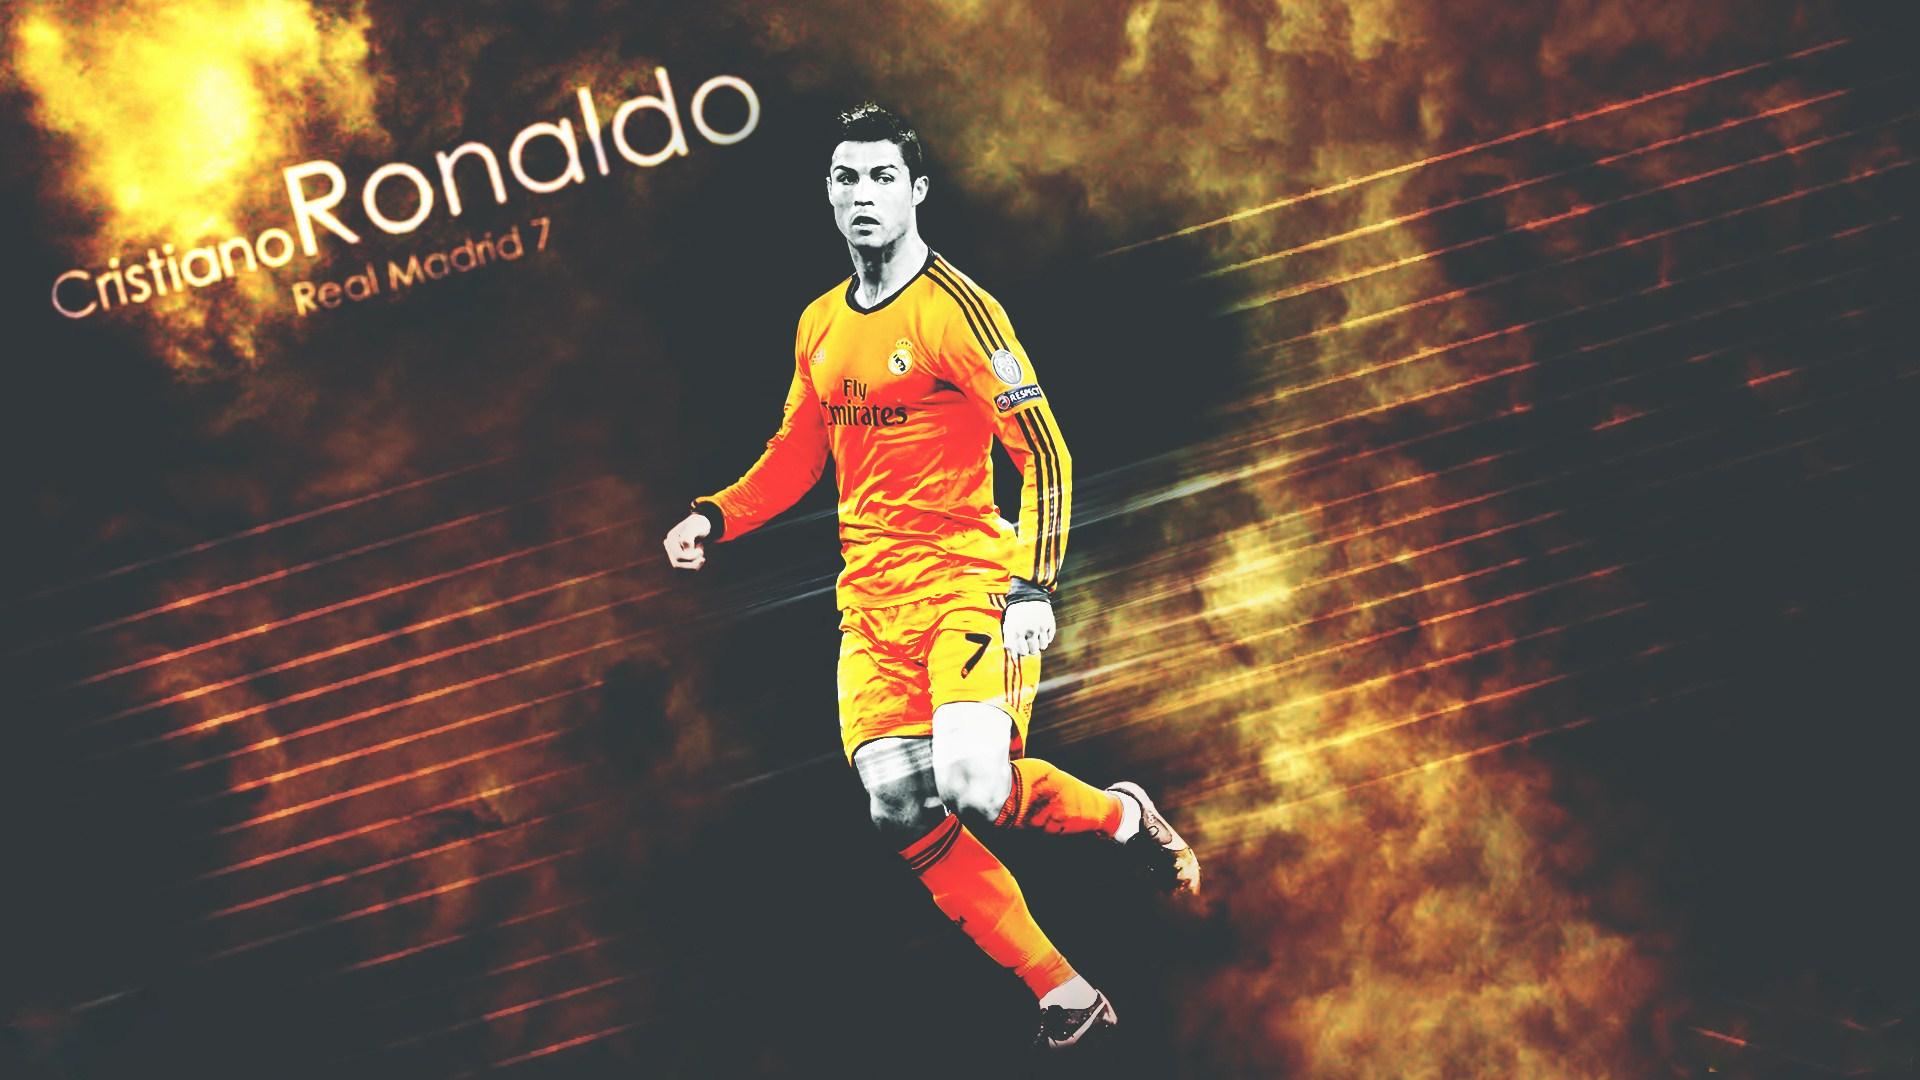 Cristiano ronaldo full hd wallpaper and background image 1920x1080 sports cristiano ronaldo real madrid cf wallpaper voltagebd Images